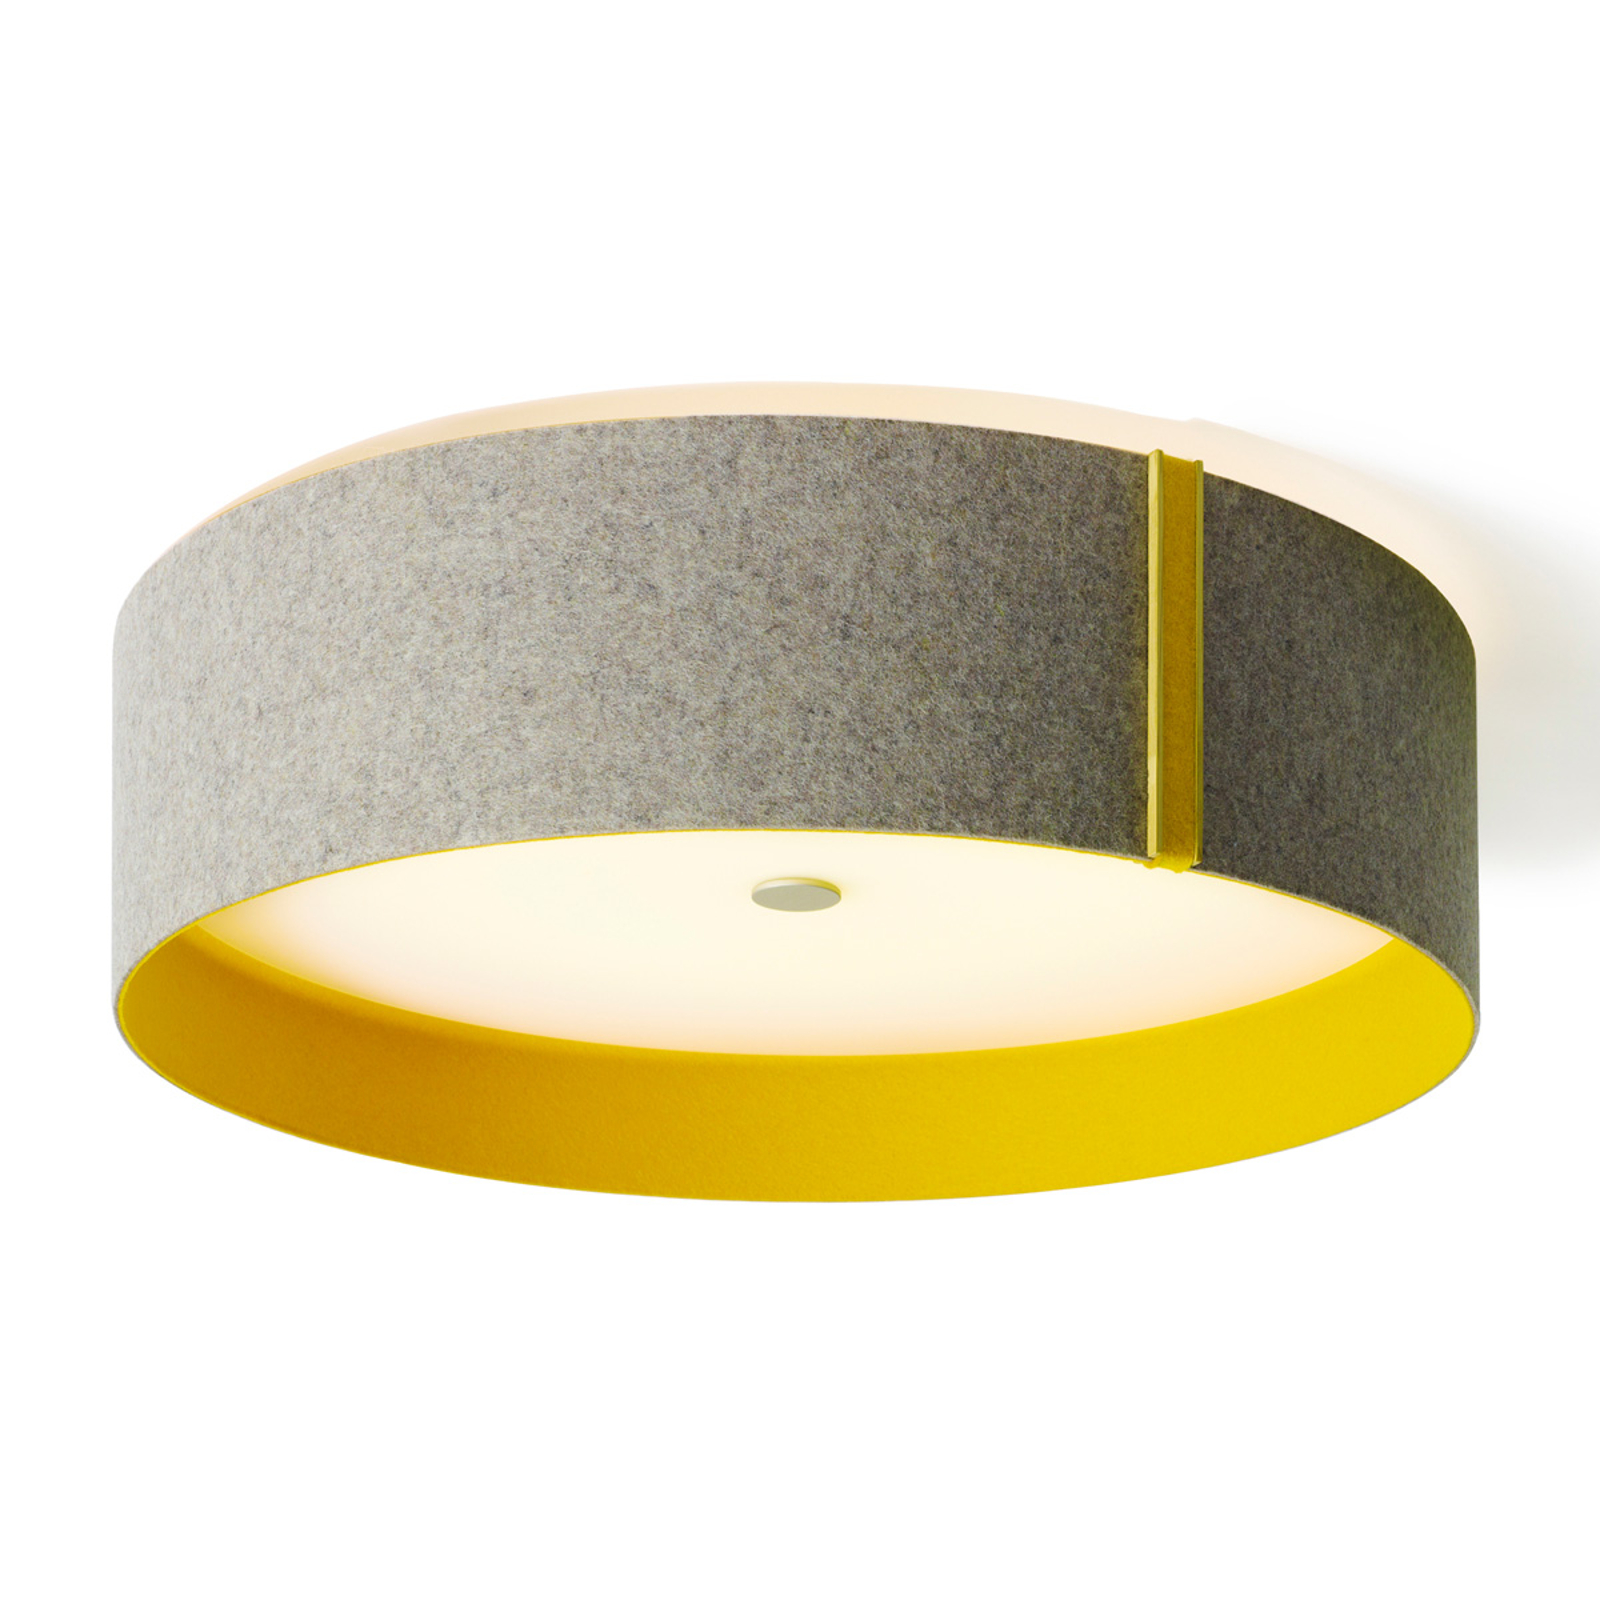 Lampa sufitowa LARAfelt z filcu, LED, szary/curry